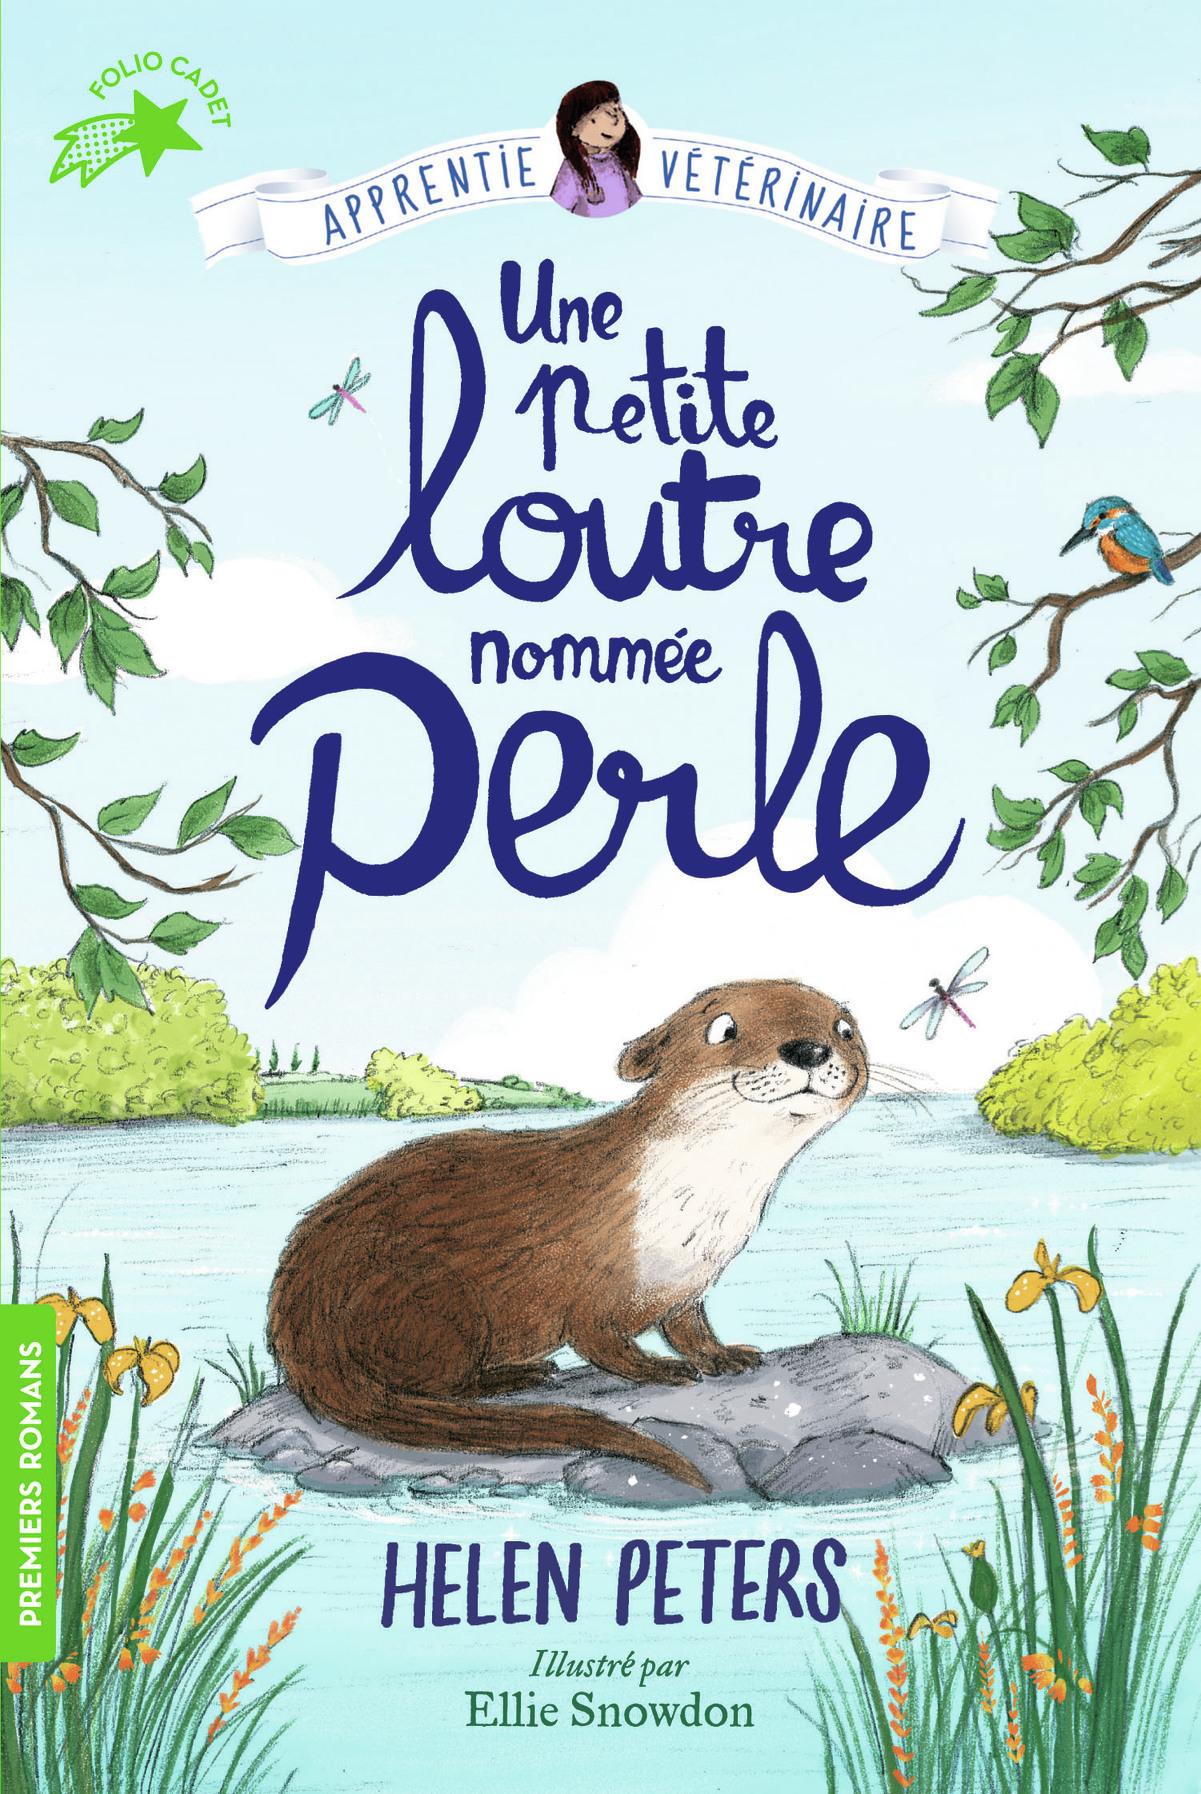 JASMINE, L'APPRENTIE VETERINAIRE, 6 : UNE PETITE LOUTRE NOMMEE PERLE